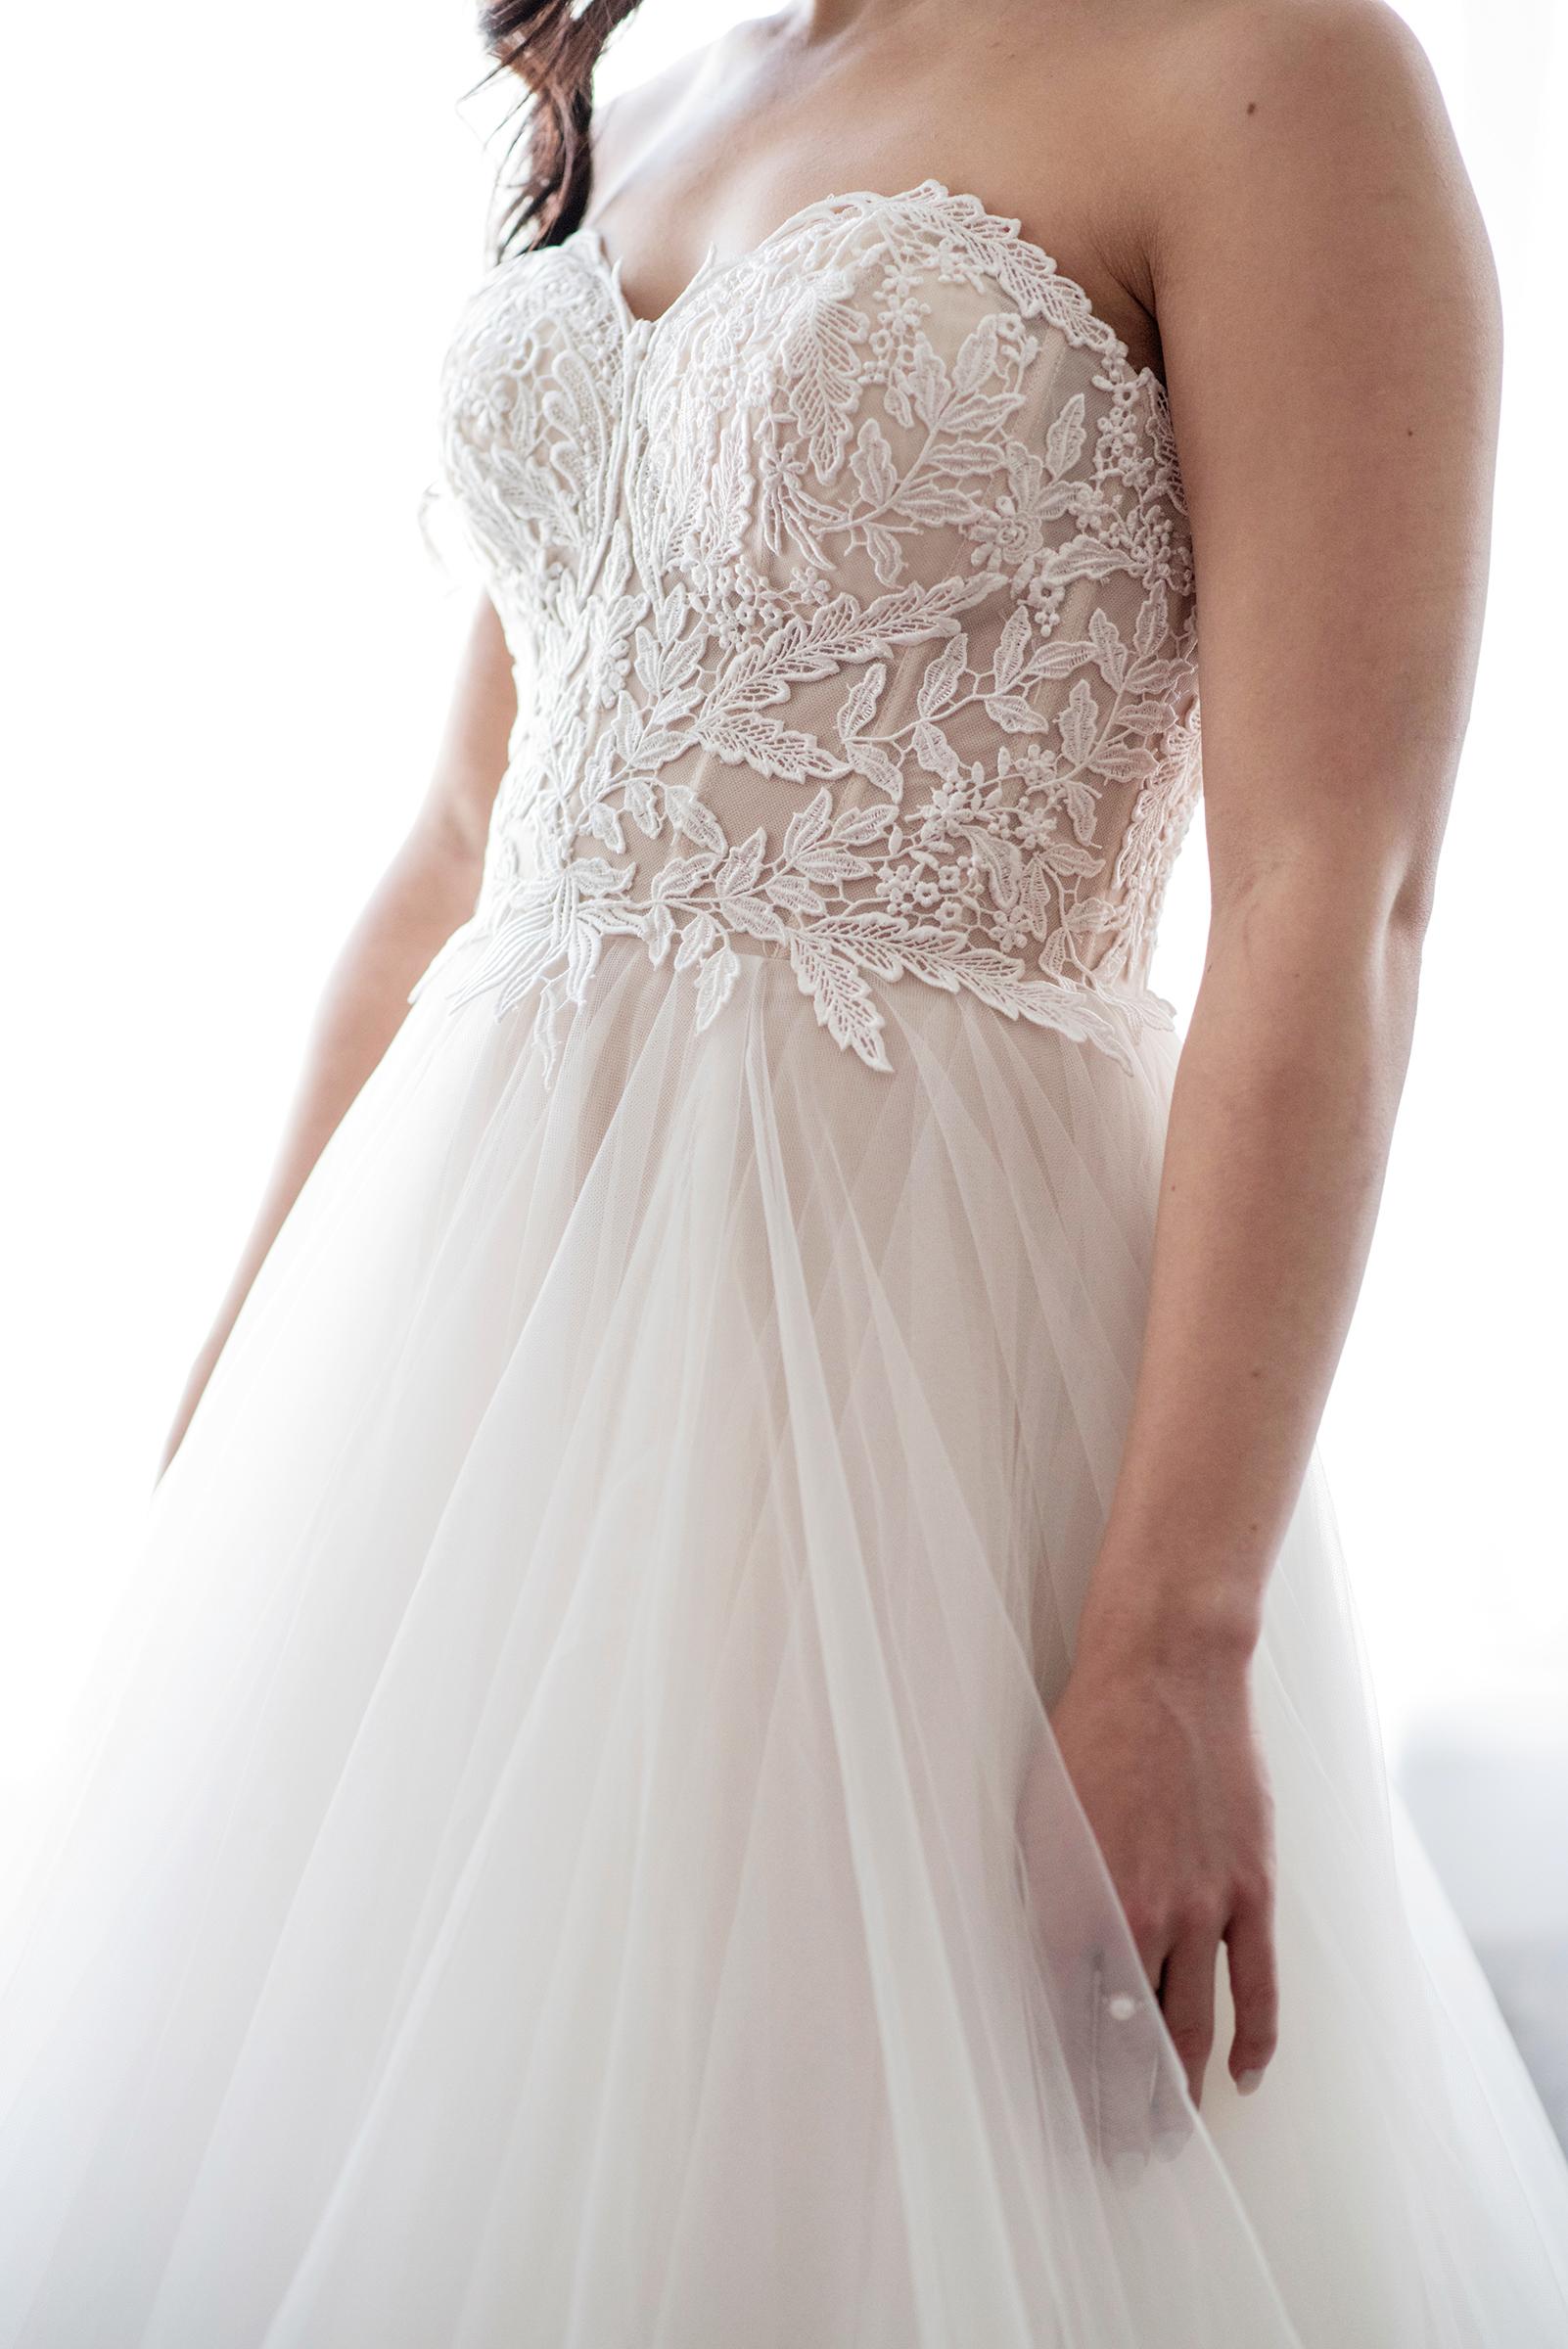 Stephanie-Fourth Dress Details-6.jpg